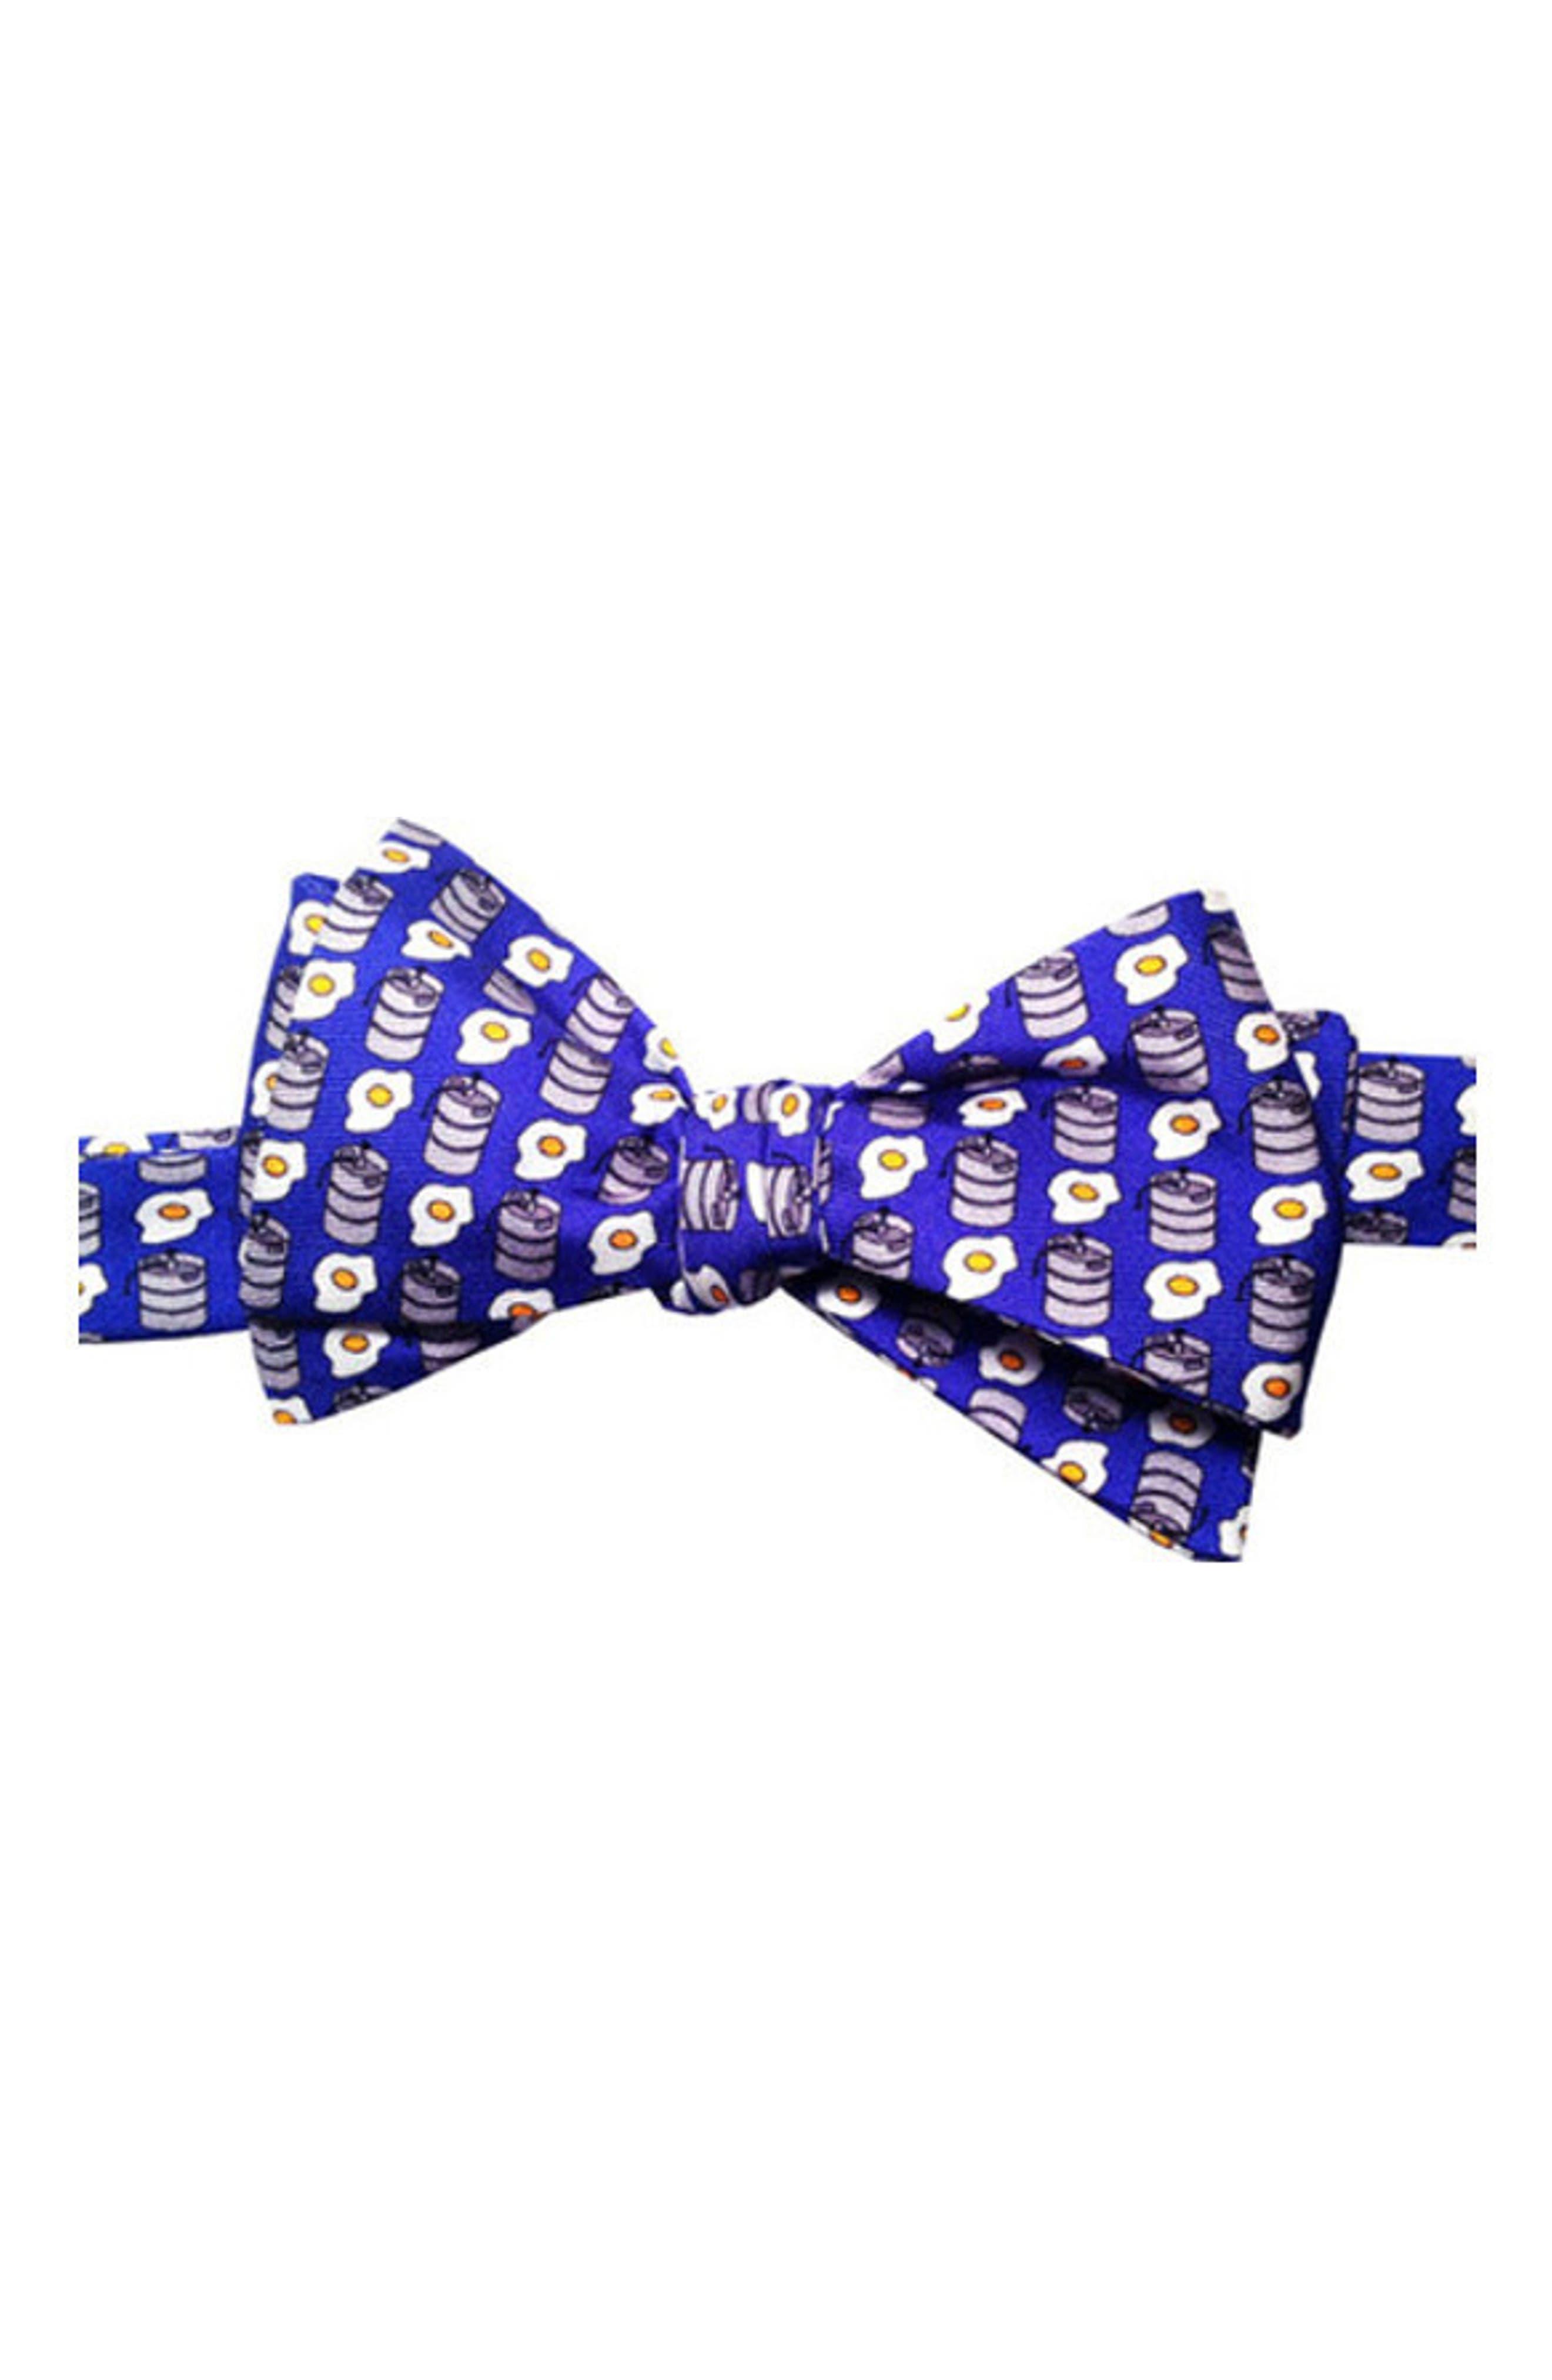 Kegs & Eggs Silk Bow Tie,                         Main,                         color, Blue